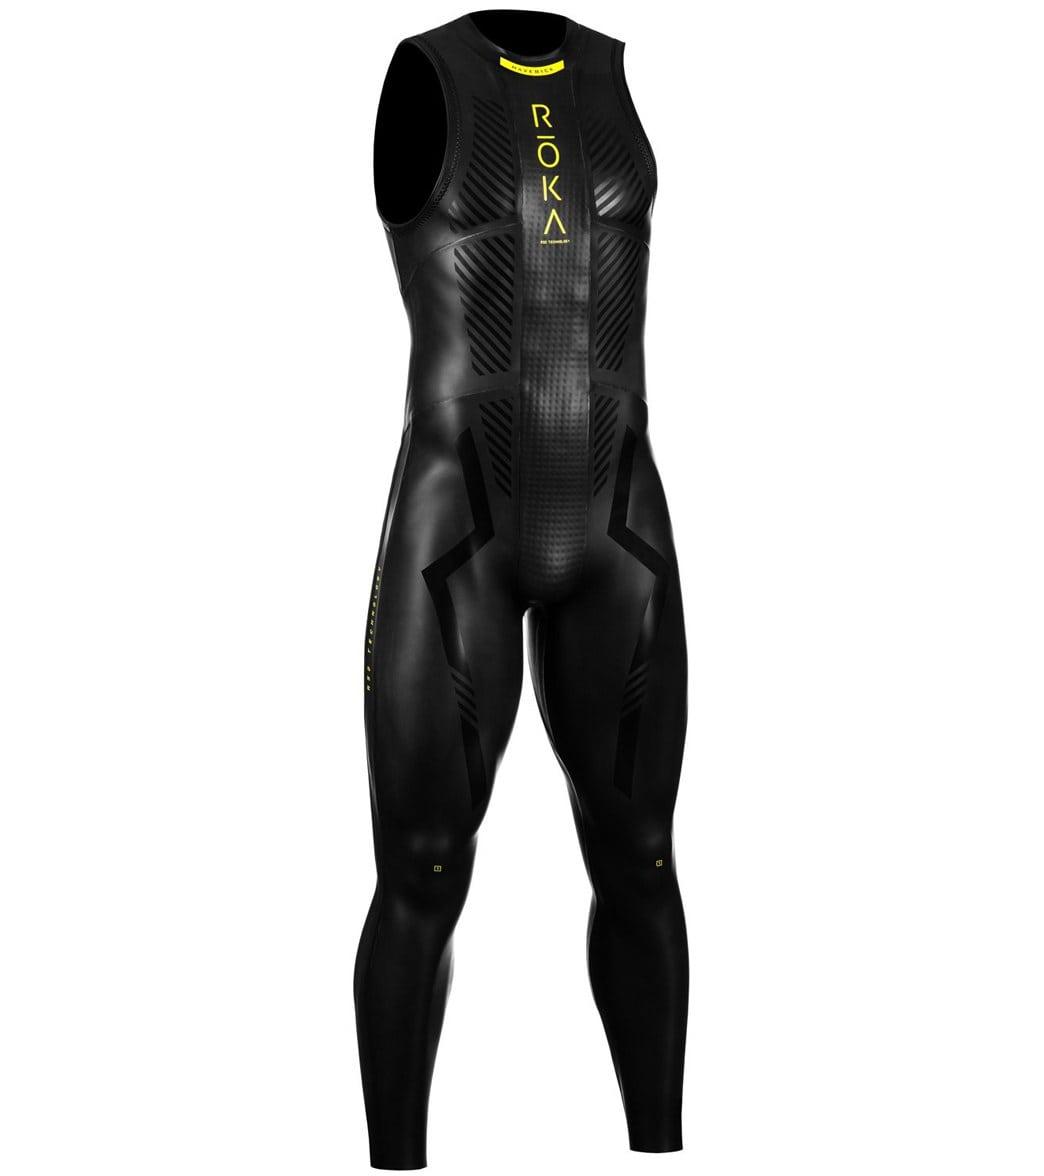 33882b4525 ROKA Men's Maverick Pro II Sleeveless Tri Wetsuit at SwimOutlet.com - Free  Shipping